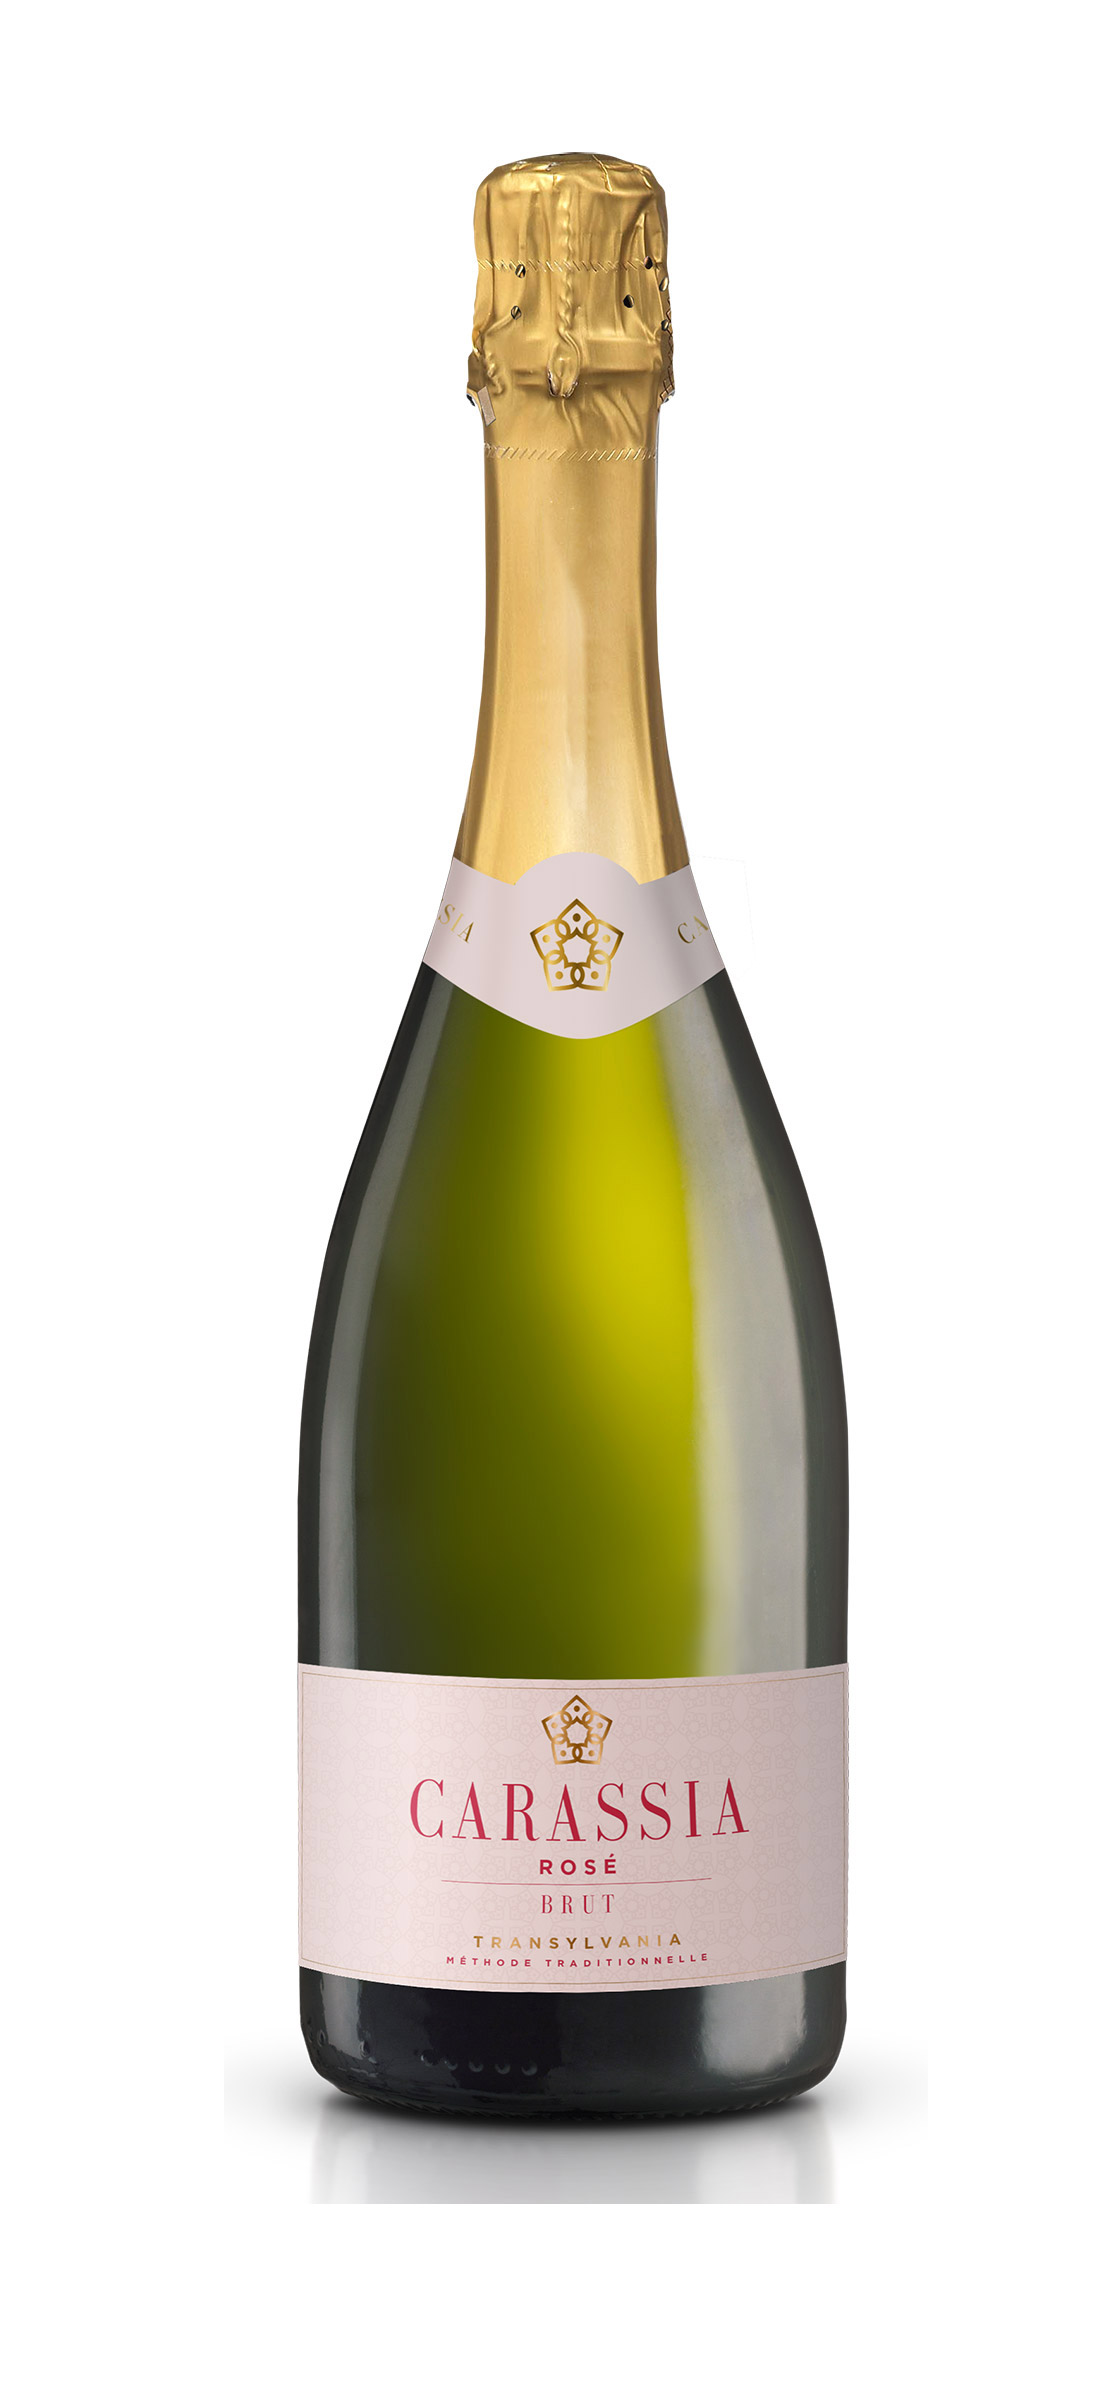 Vin spumant - Carassia Pinot Noir rose, brut, 2015 Carastelec Winery